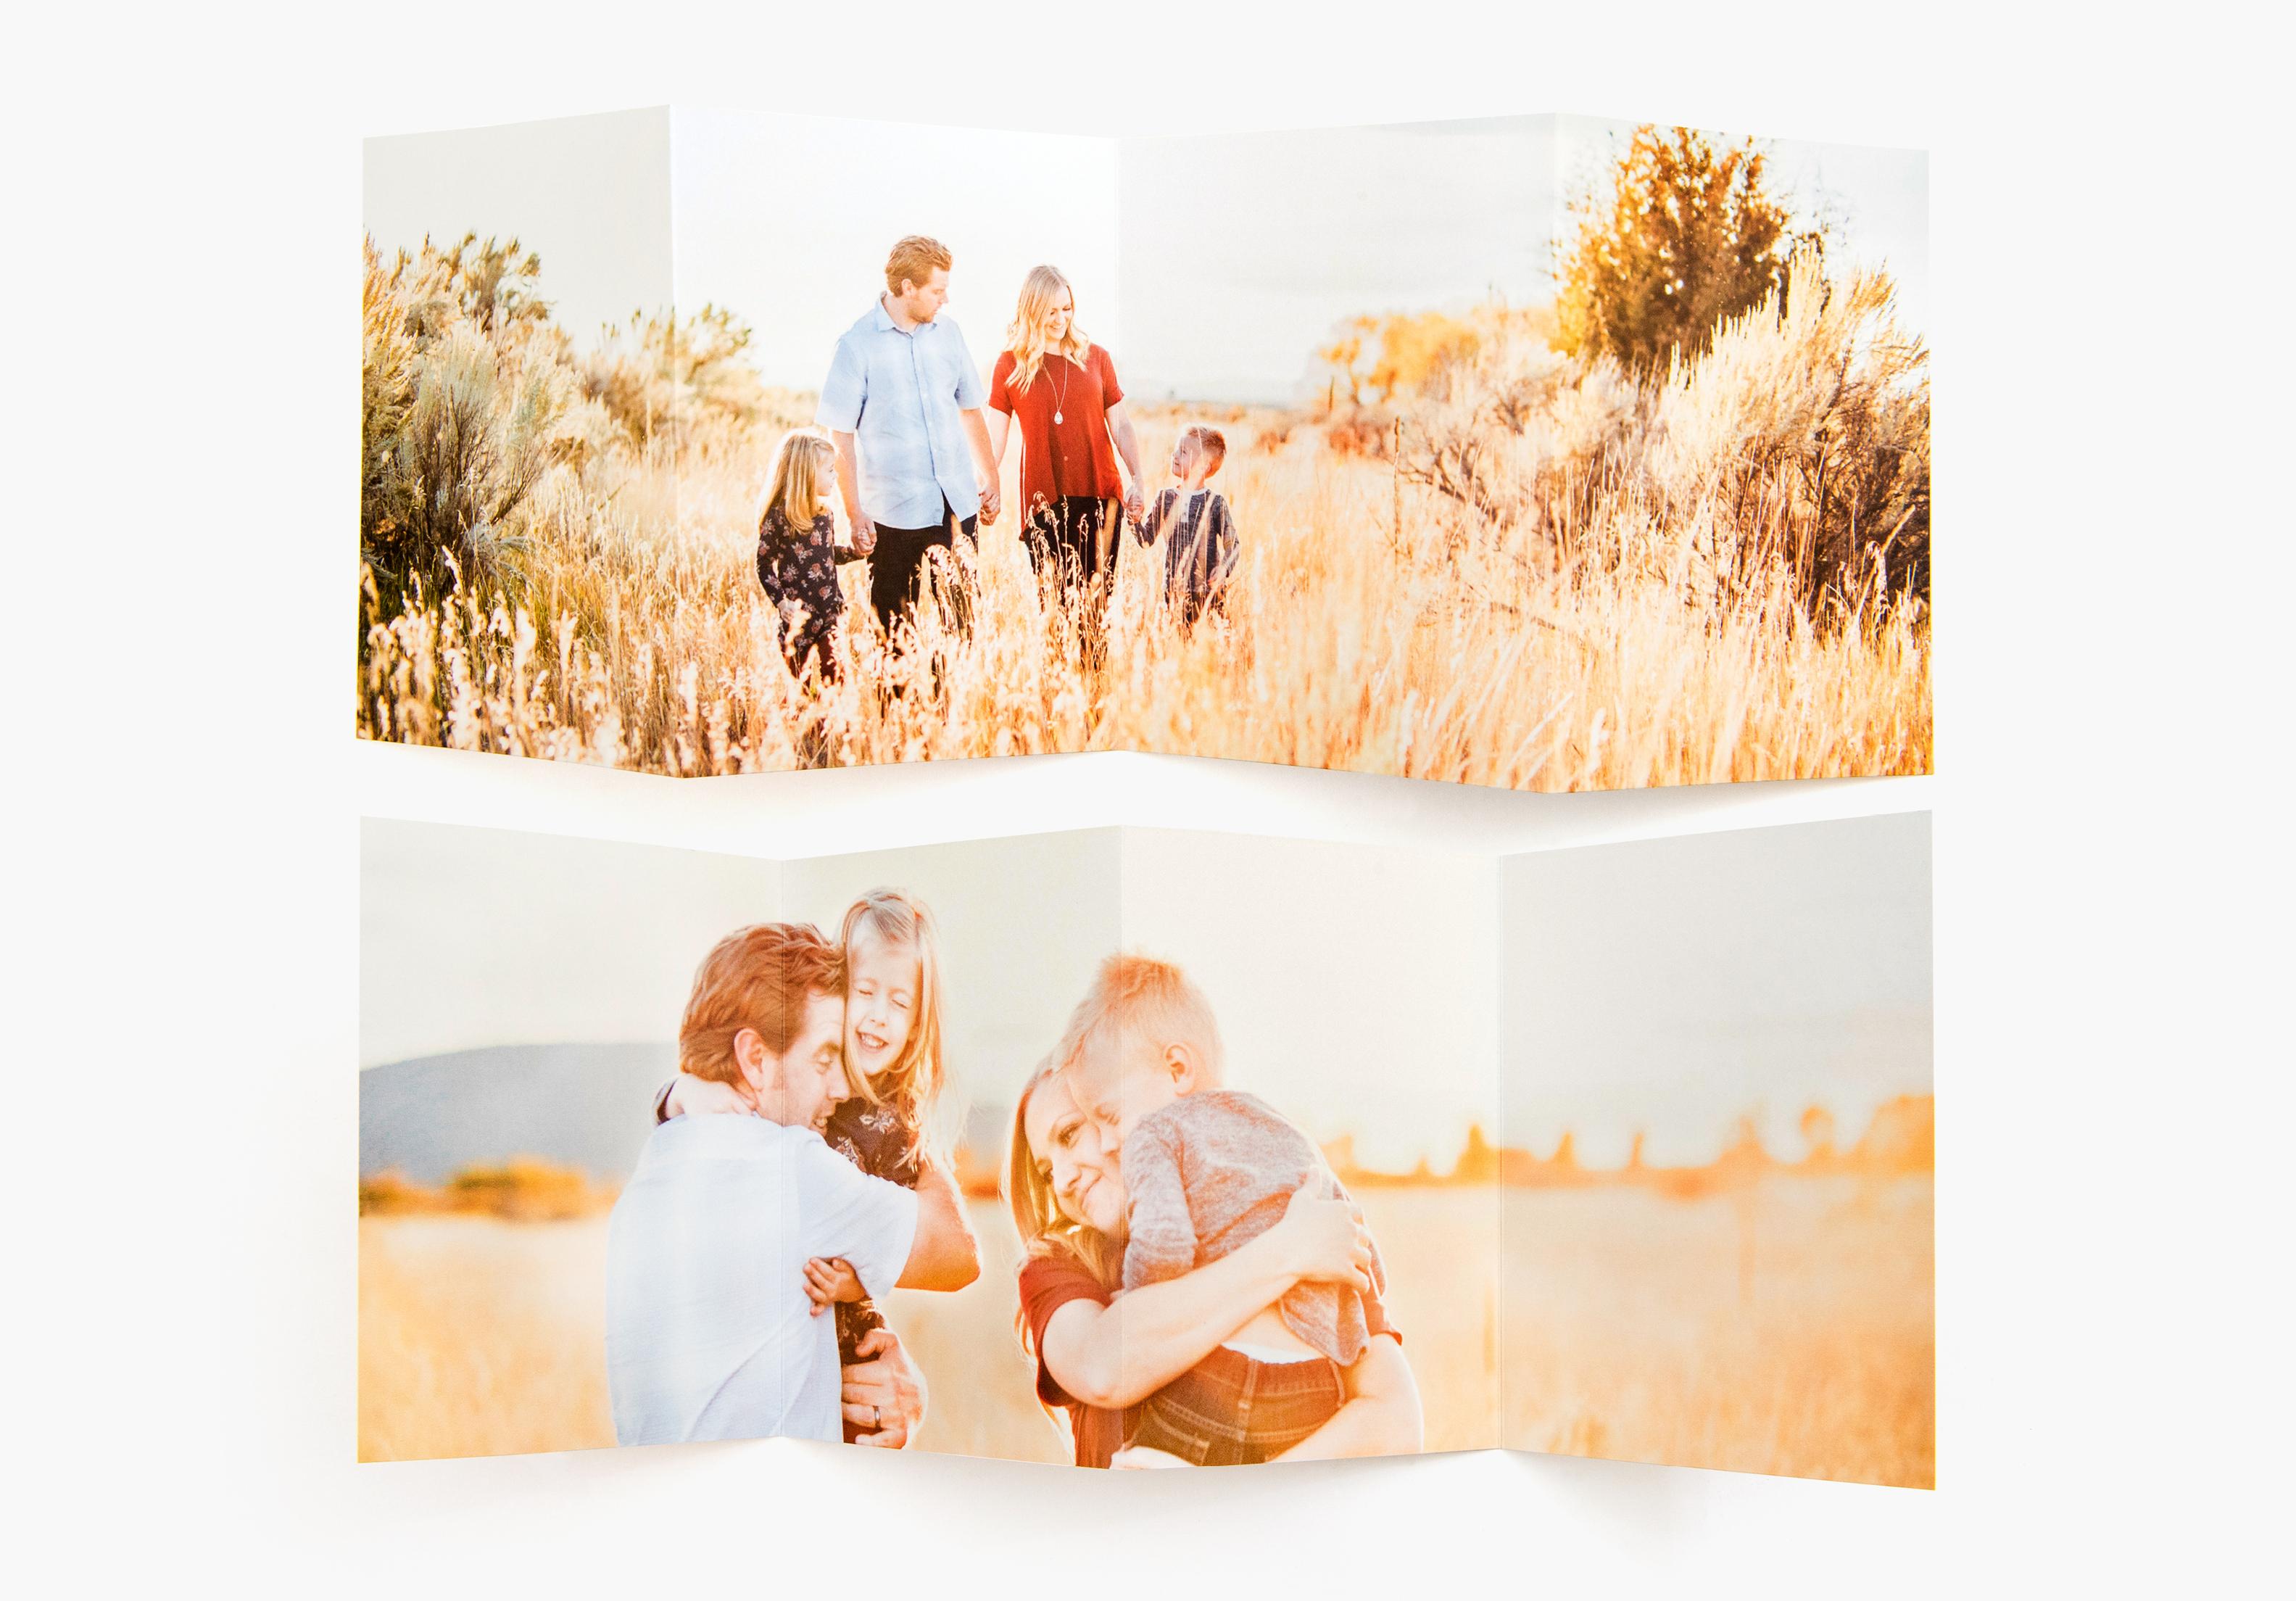 accordion fold photo cards nations photo lab